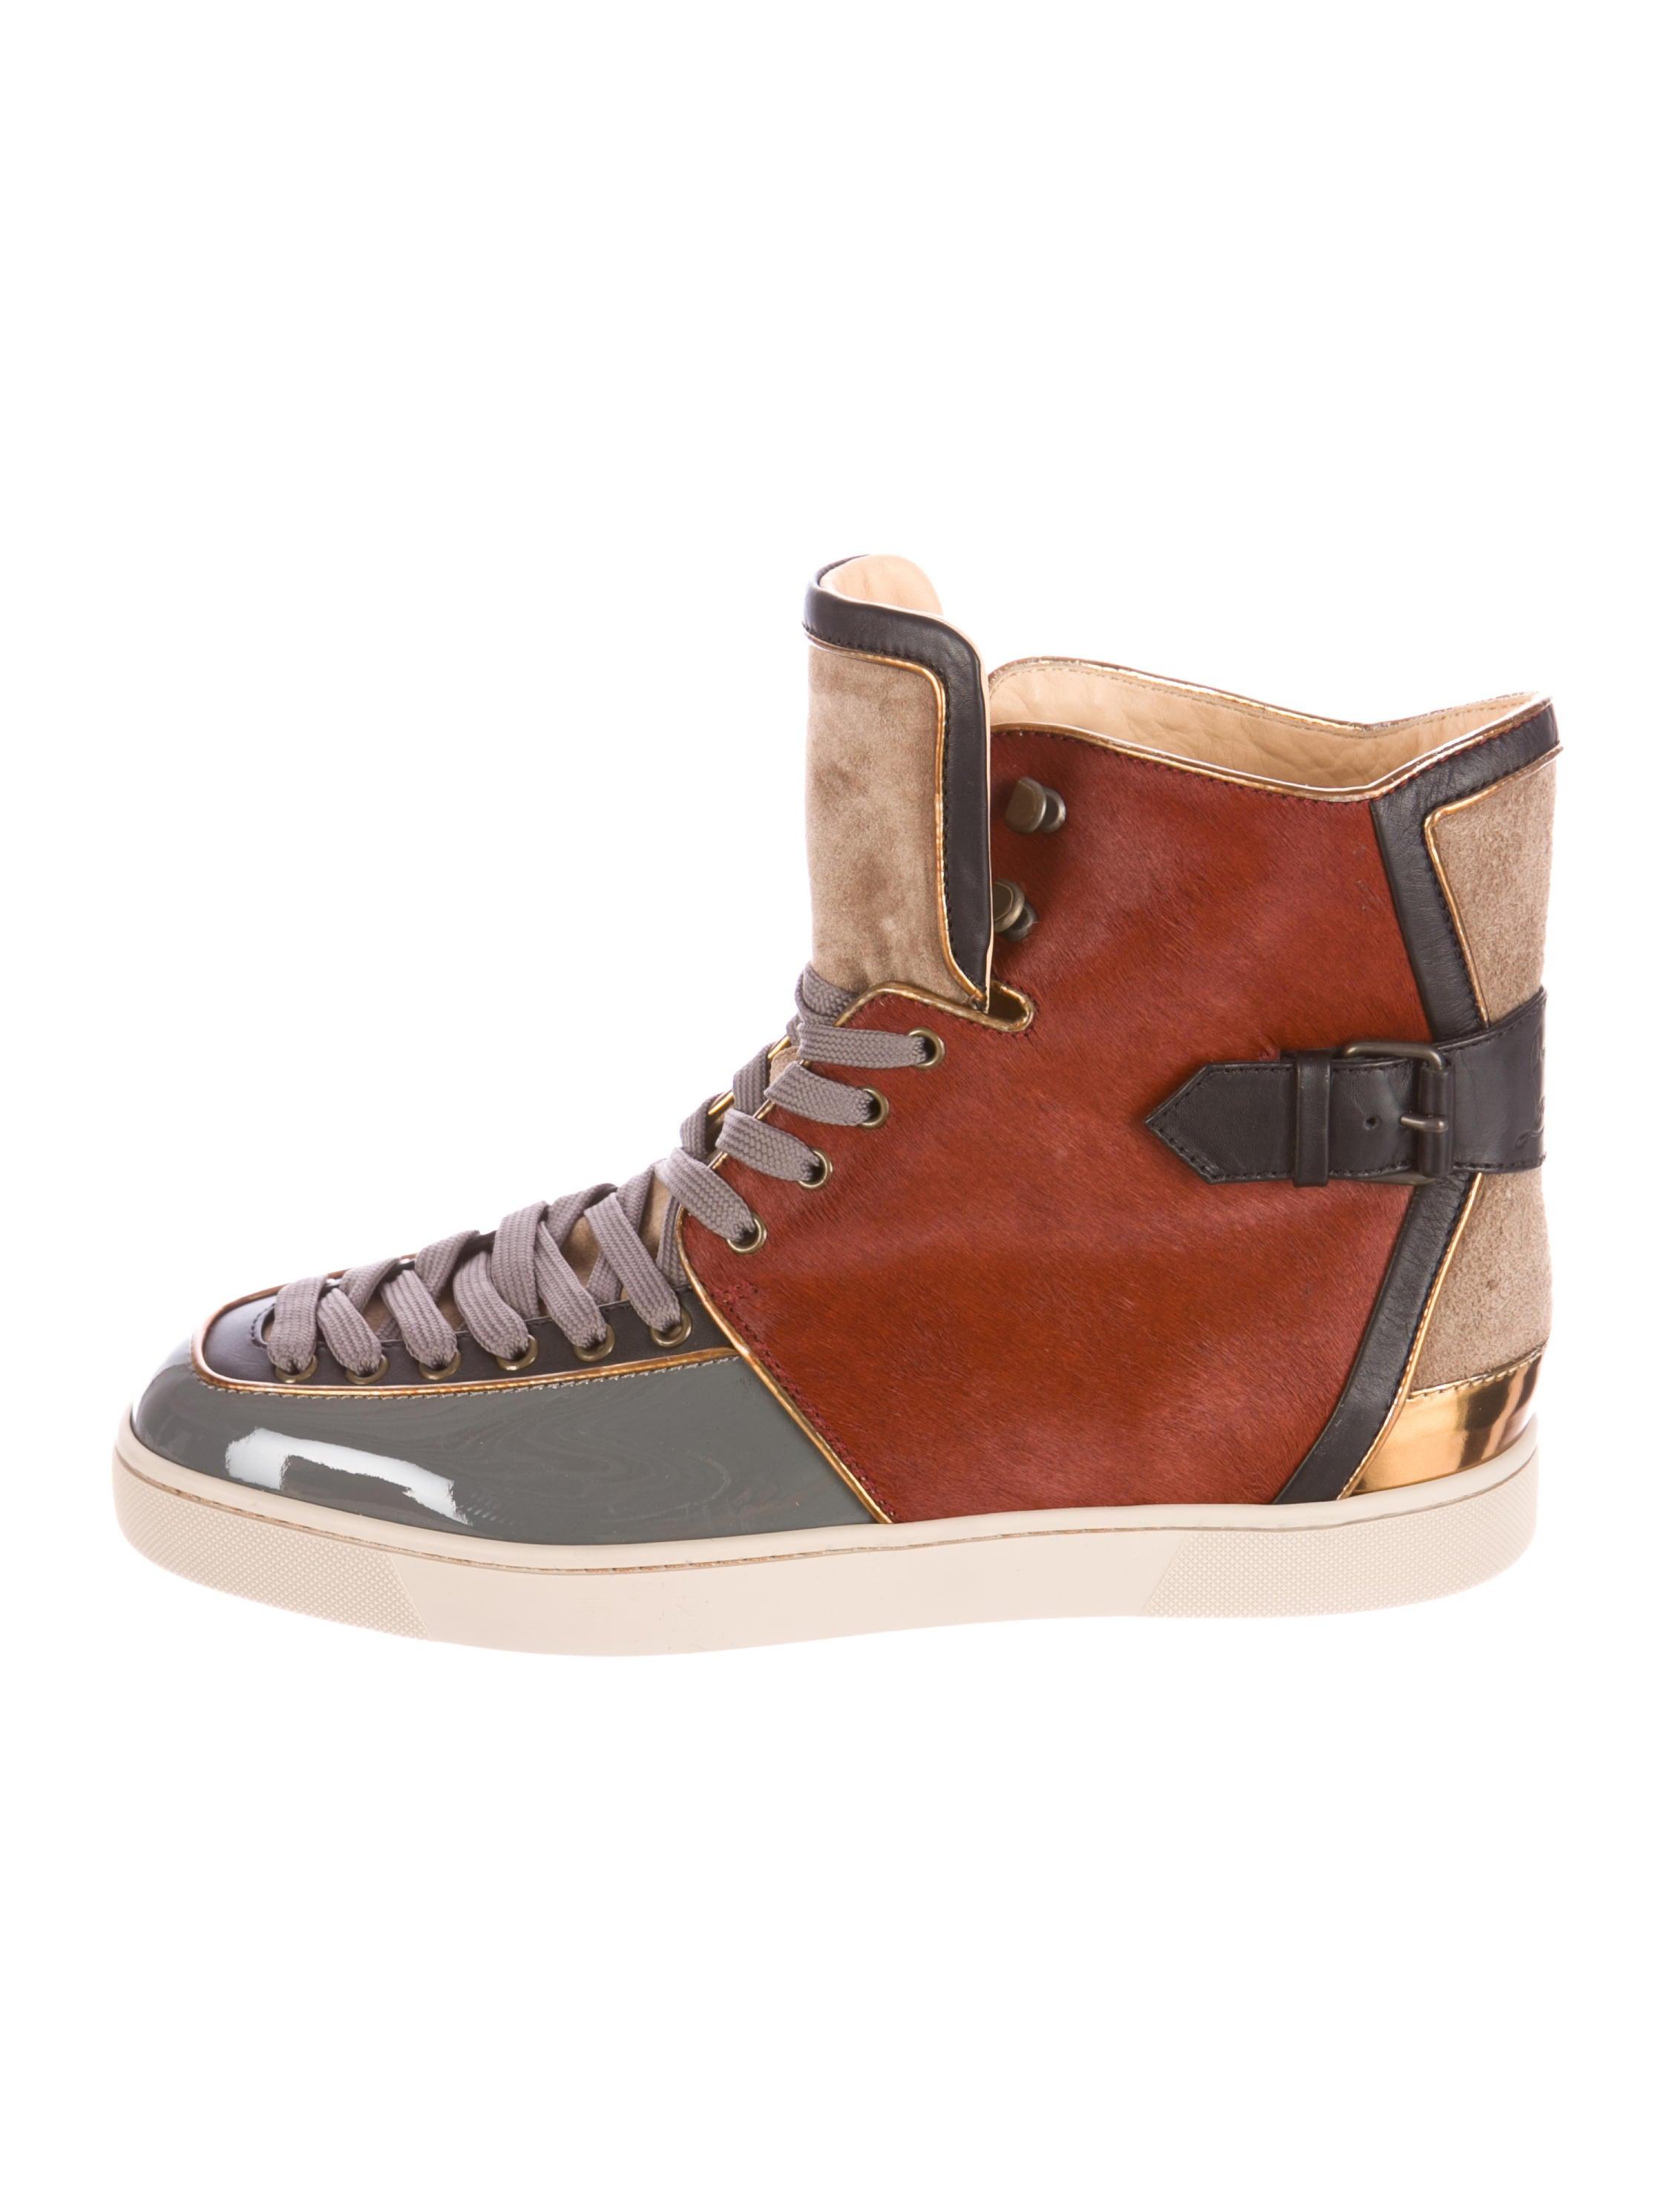 new concept 551d0 cb08d Artesur » christian louboutin high-top sneakers burgundy ...